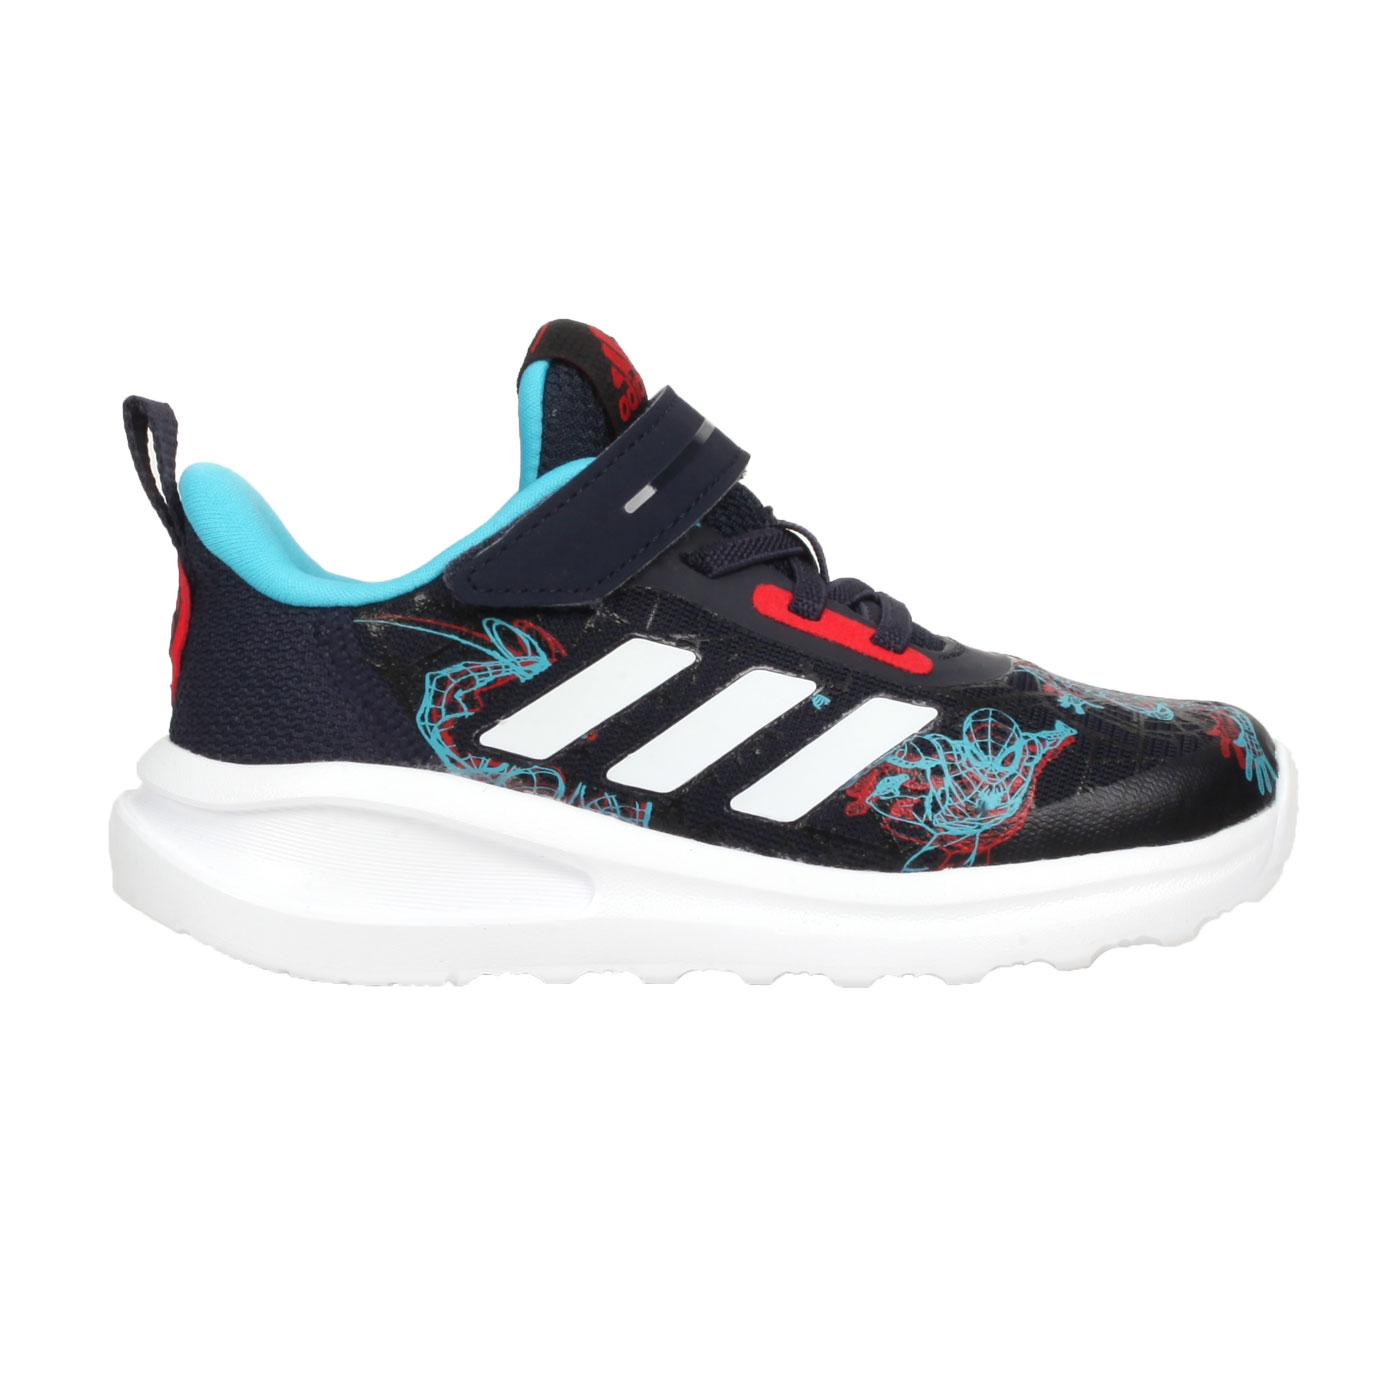 ADIDAS 小童休閒鞋  @FortaRun Spider-M EL I@FV4267